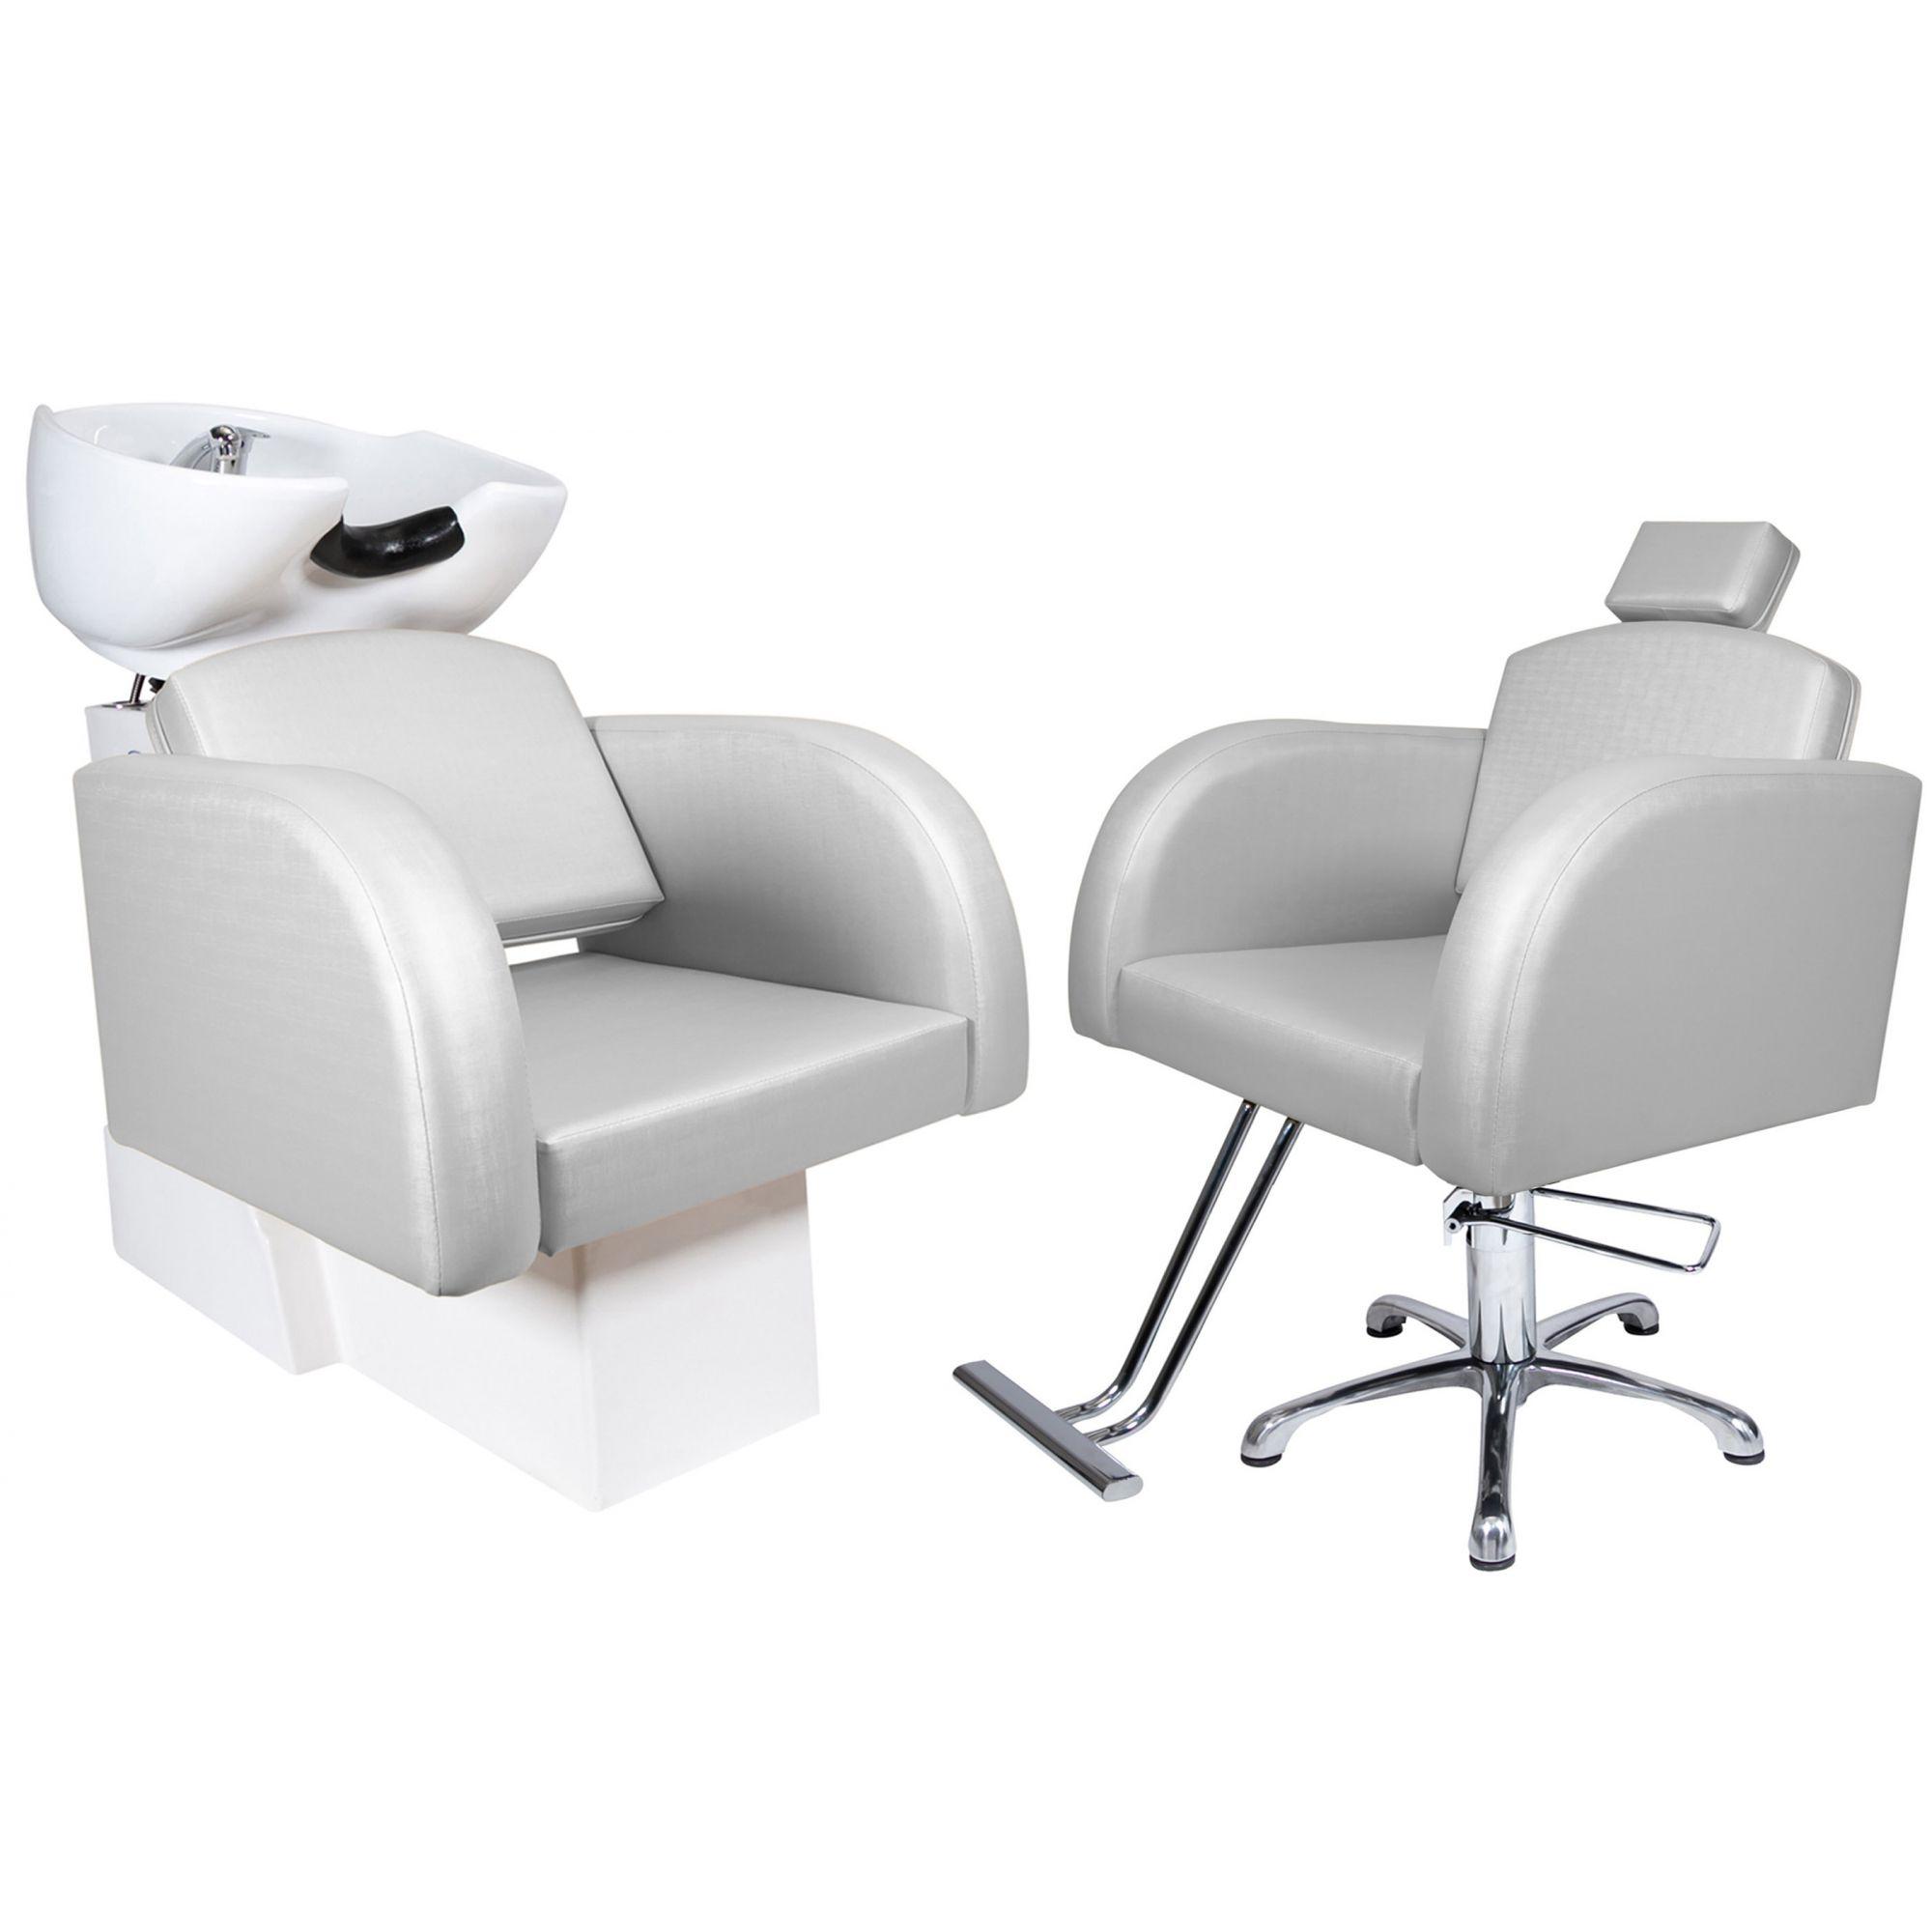 Destak Prata - Lavatorio + Cadeira Hidráulica Fixa